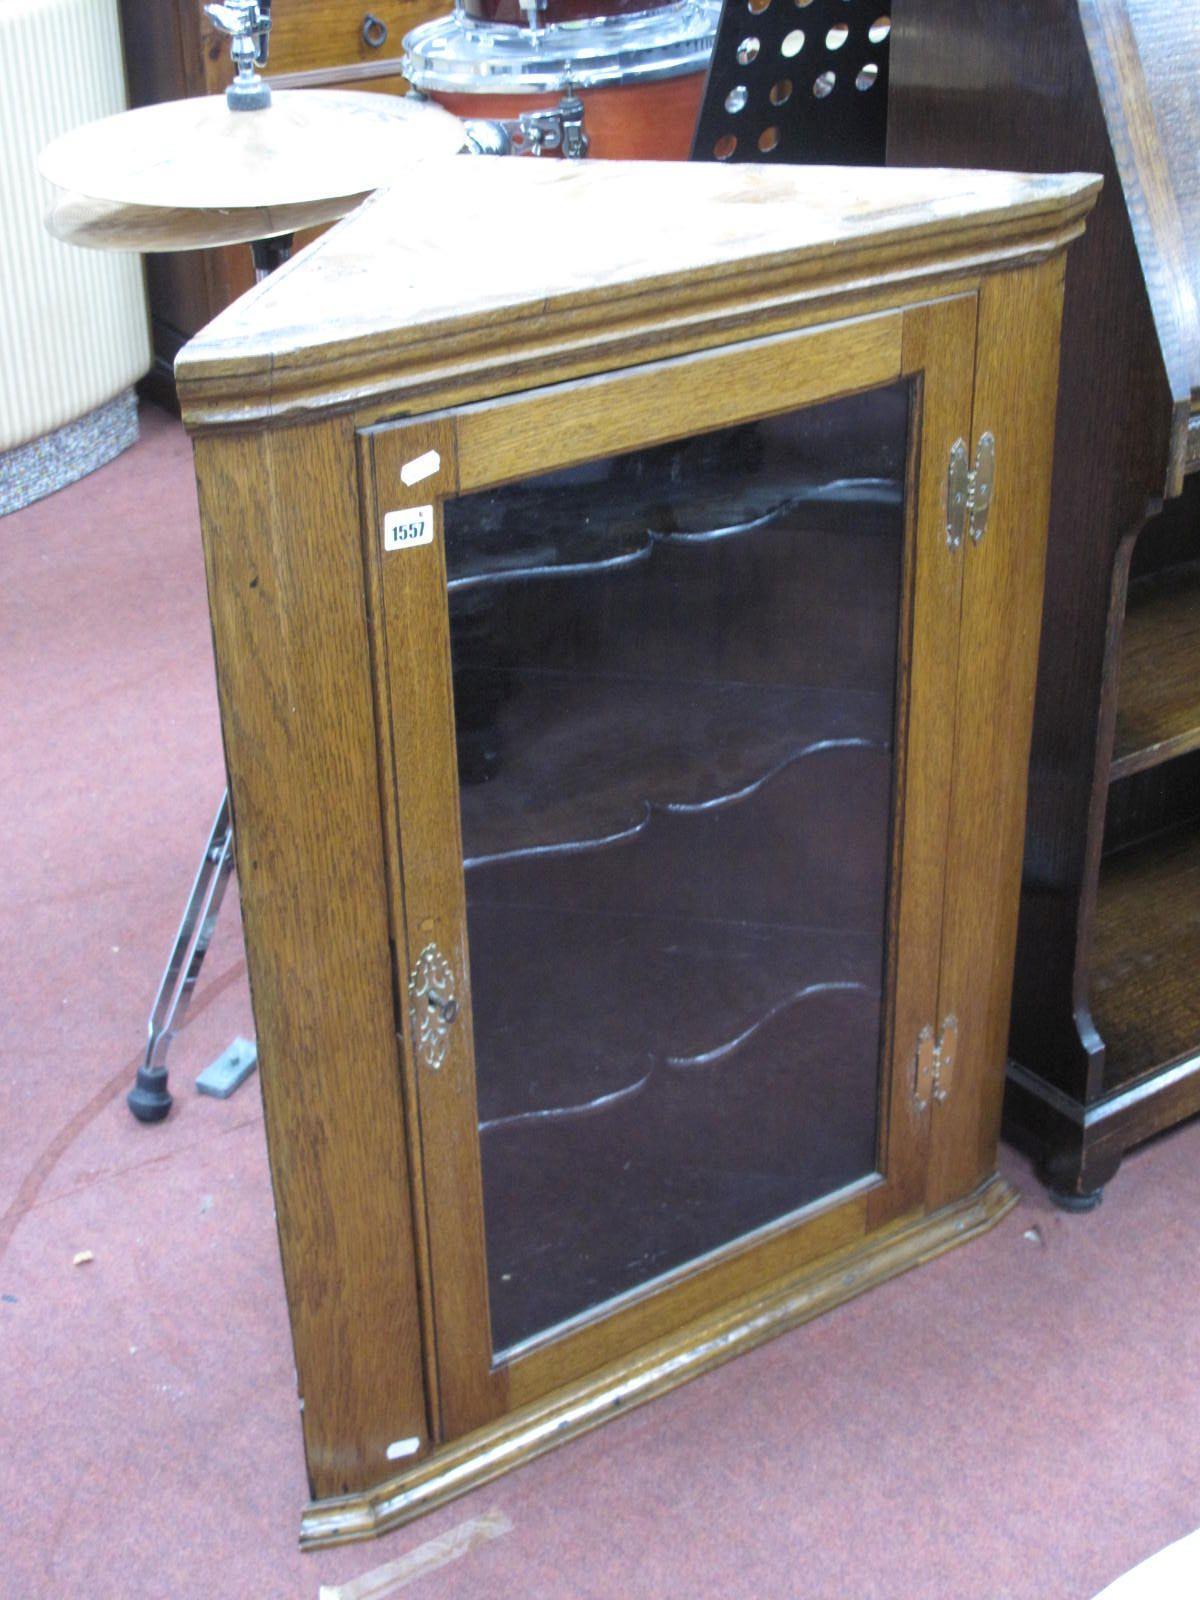 A XIX Century Oak Glazed Flat Fronted Corner Cupboard, with three internal shelves.